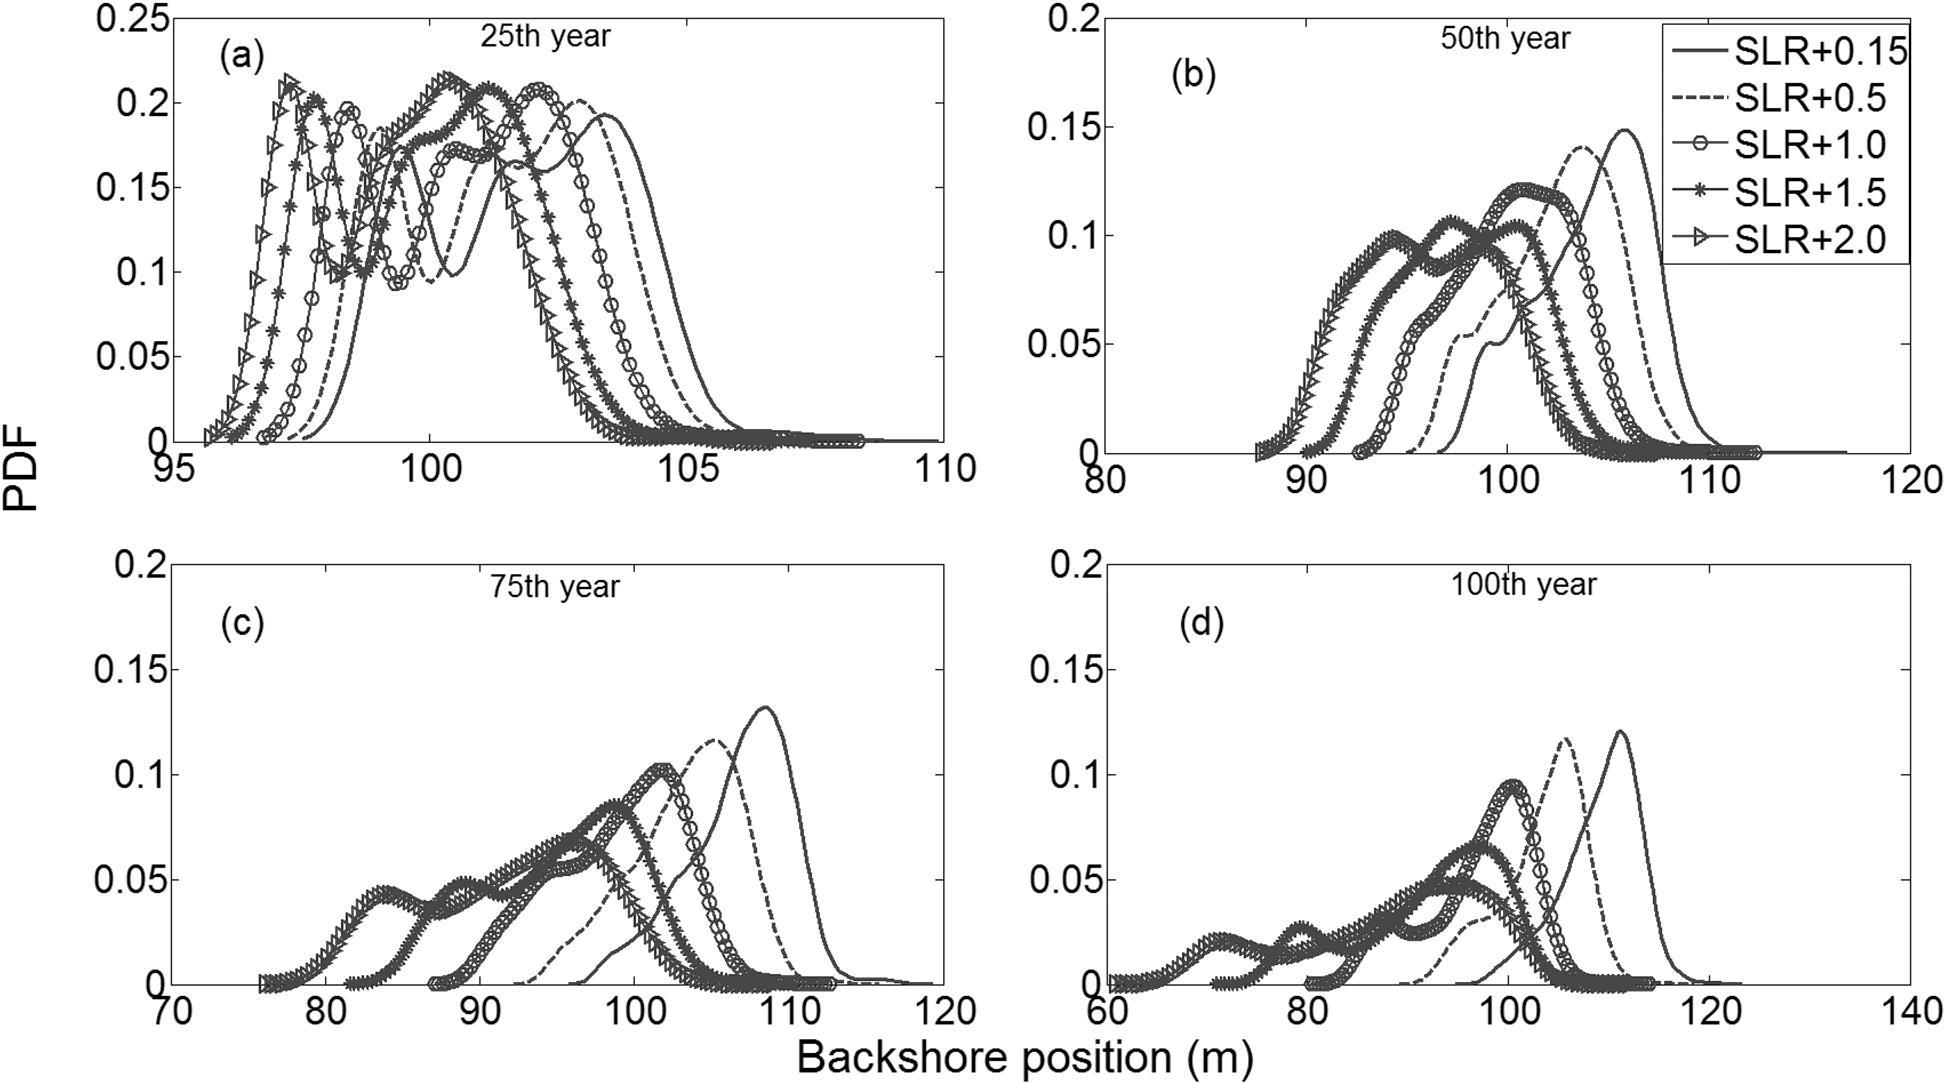 A Model For Simulating Barrier Island Geomorphologic